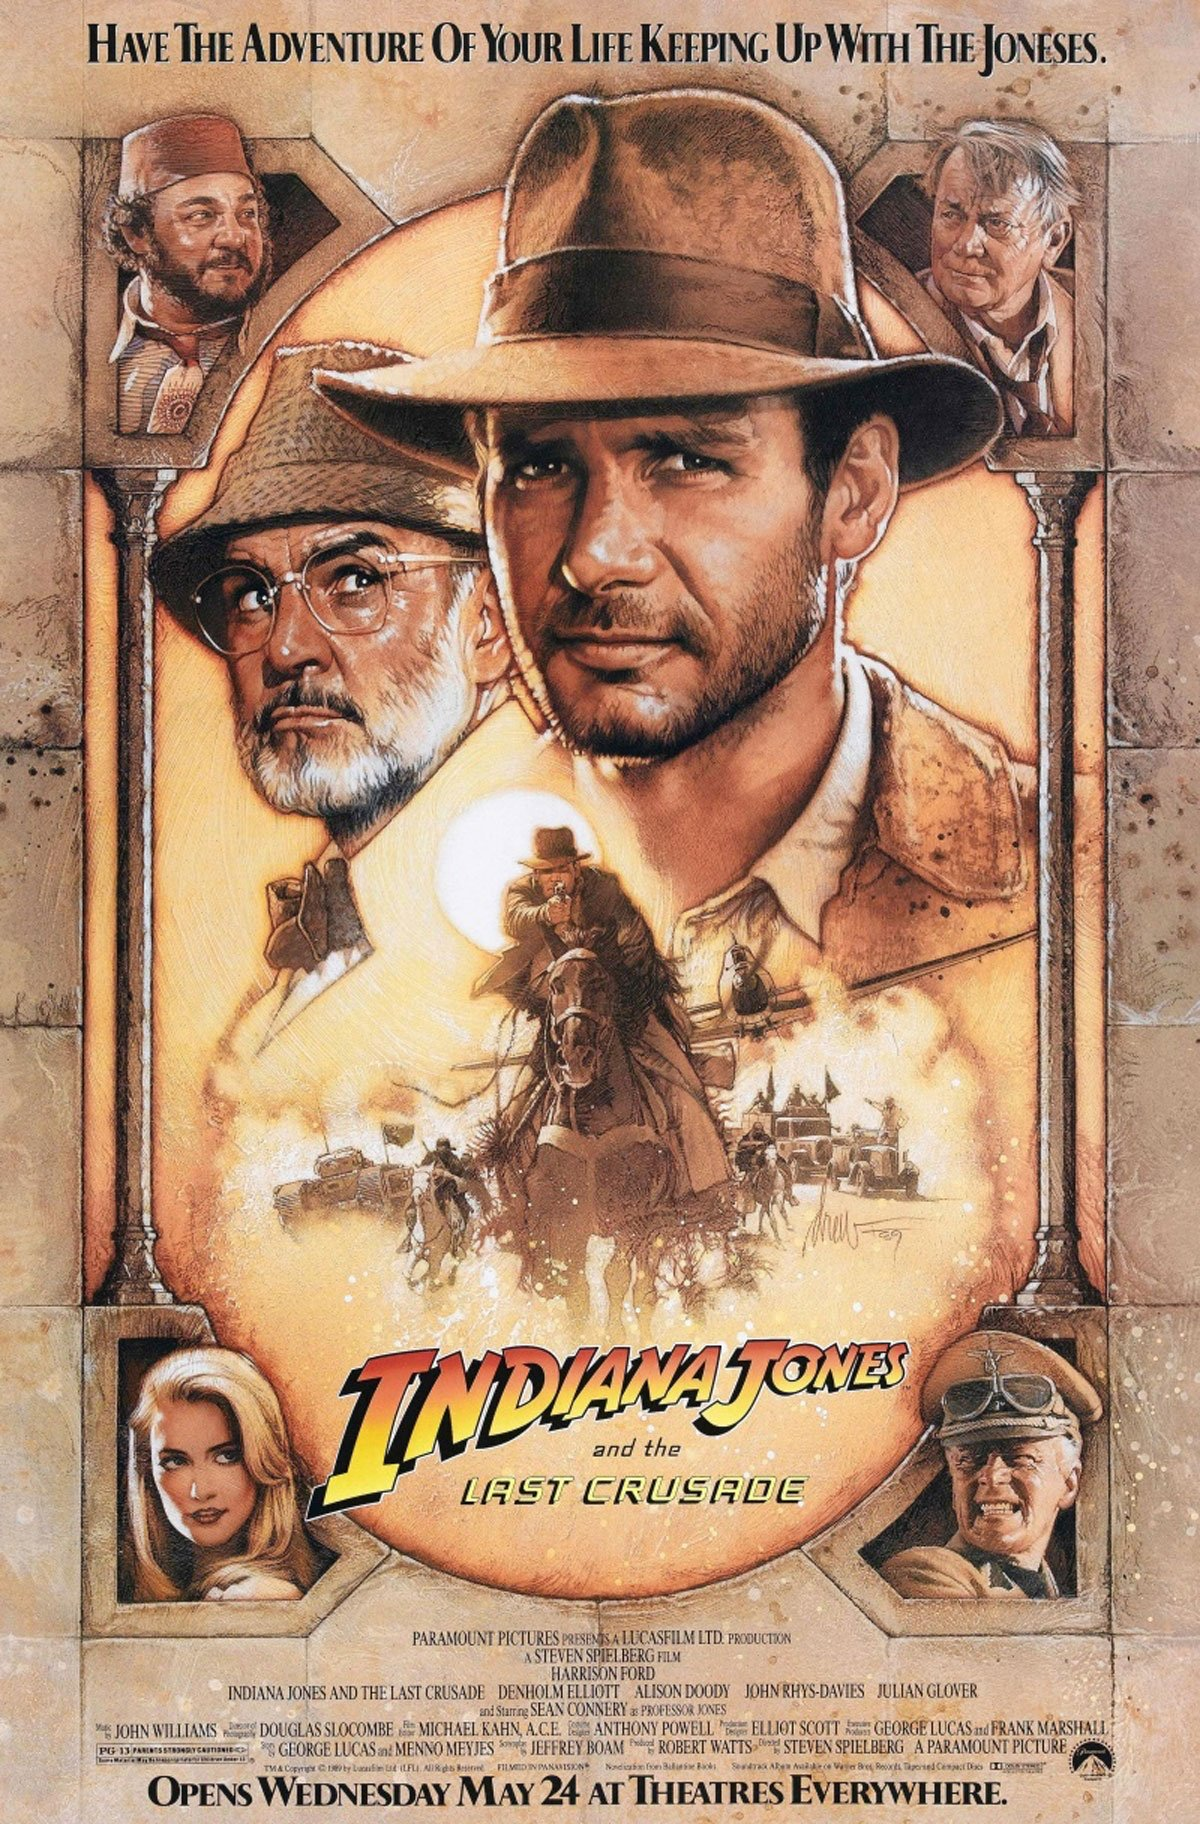 Indiana Jones and the Last Crusade, 1989